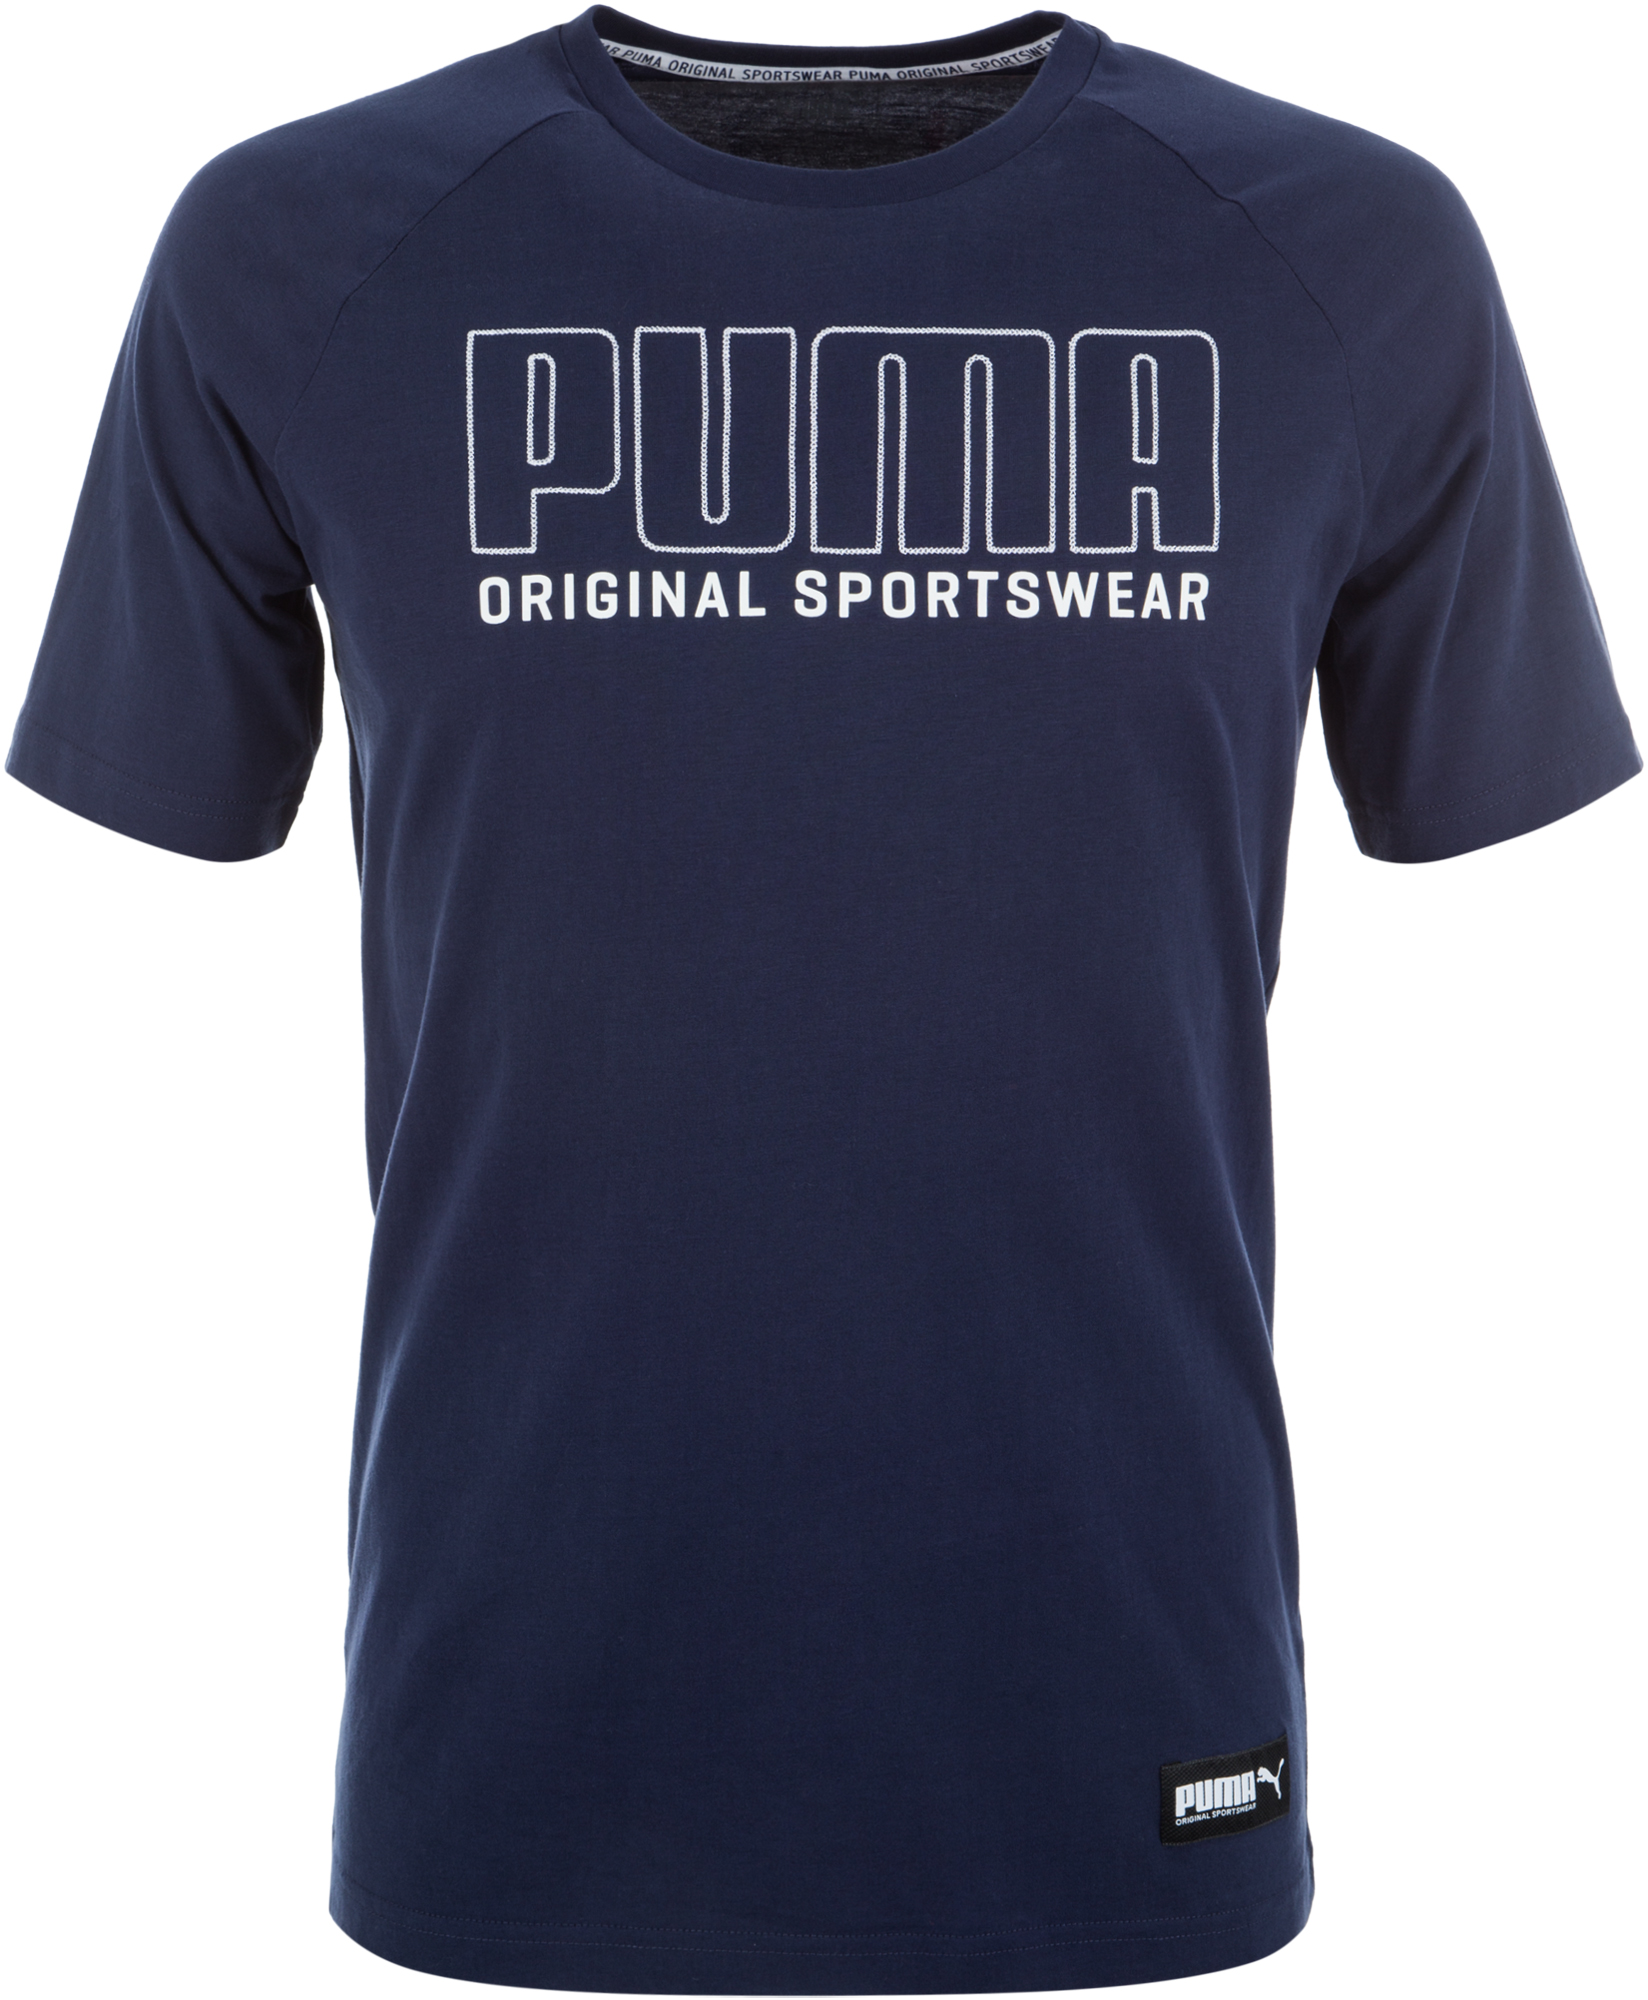 Puma Футболка мужская Puma Athletics, размер 52-54